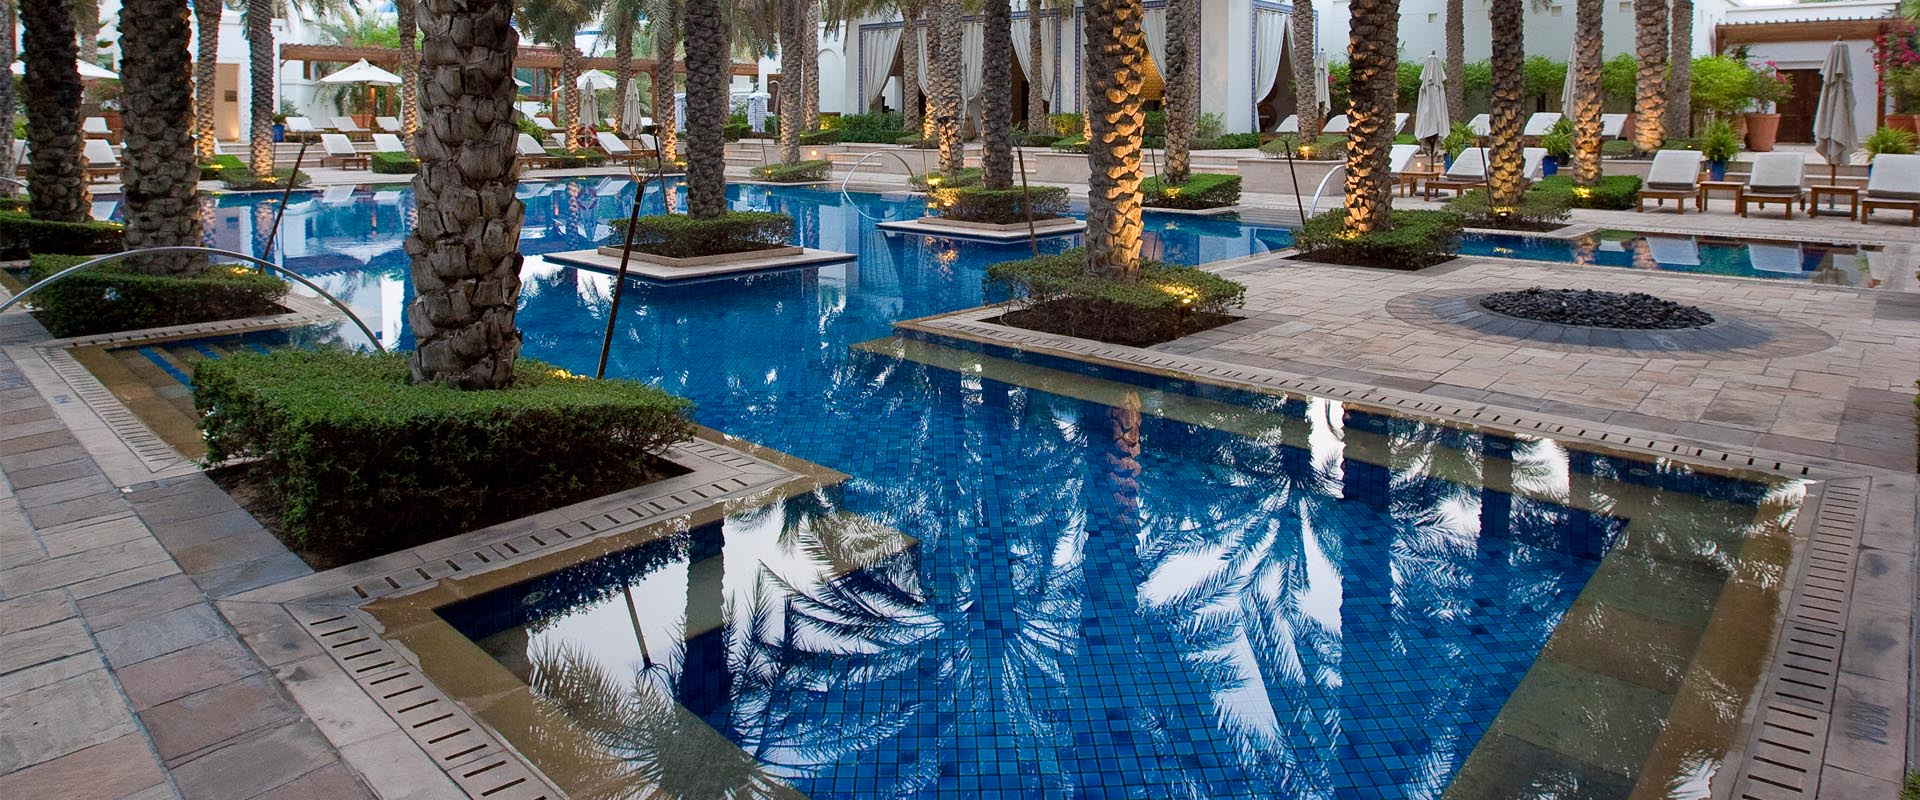 pool-refurbishment-by-desert-leisure